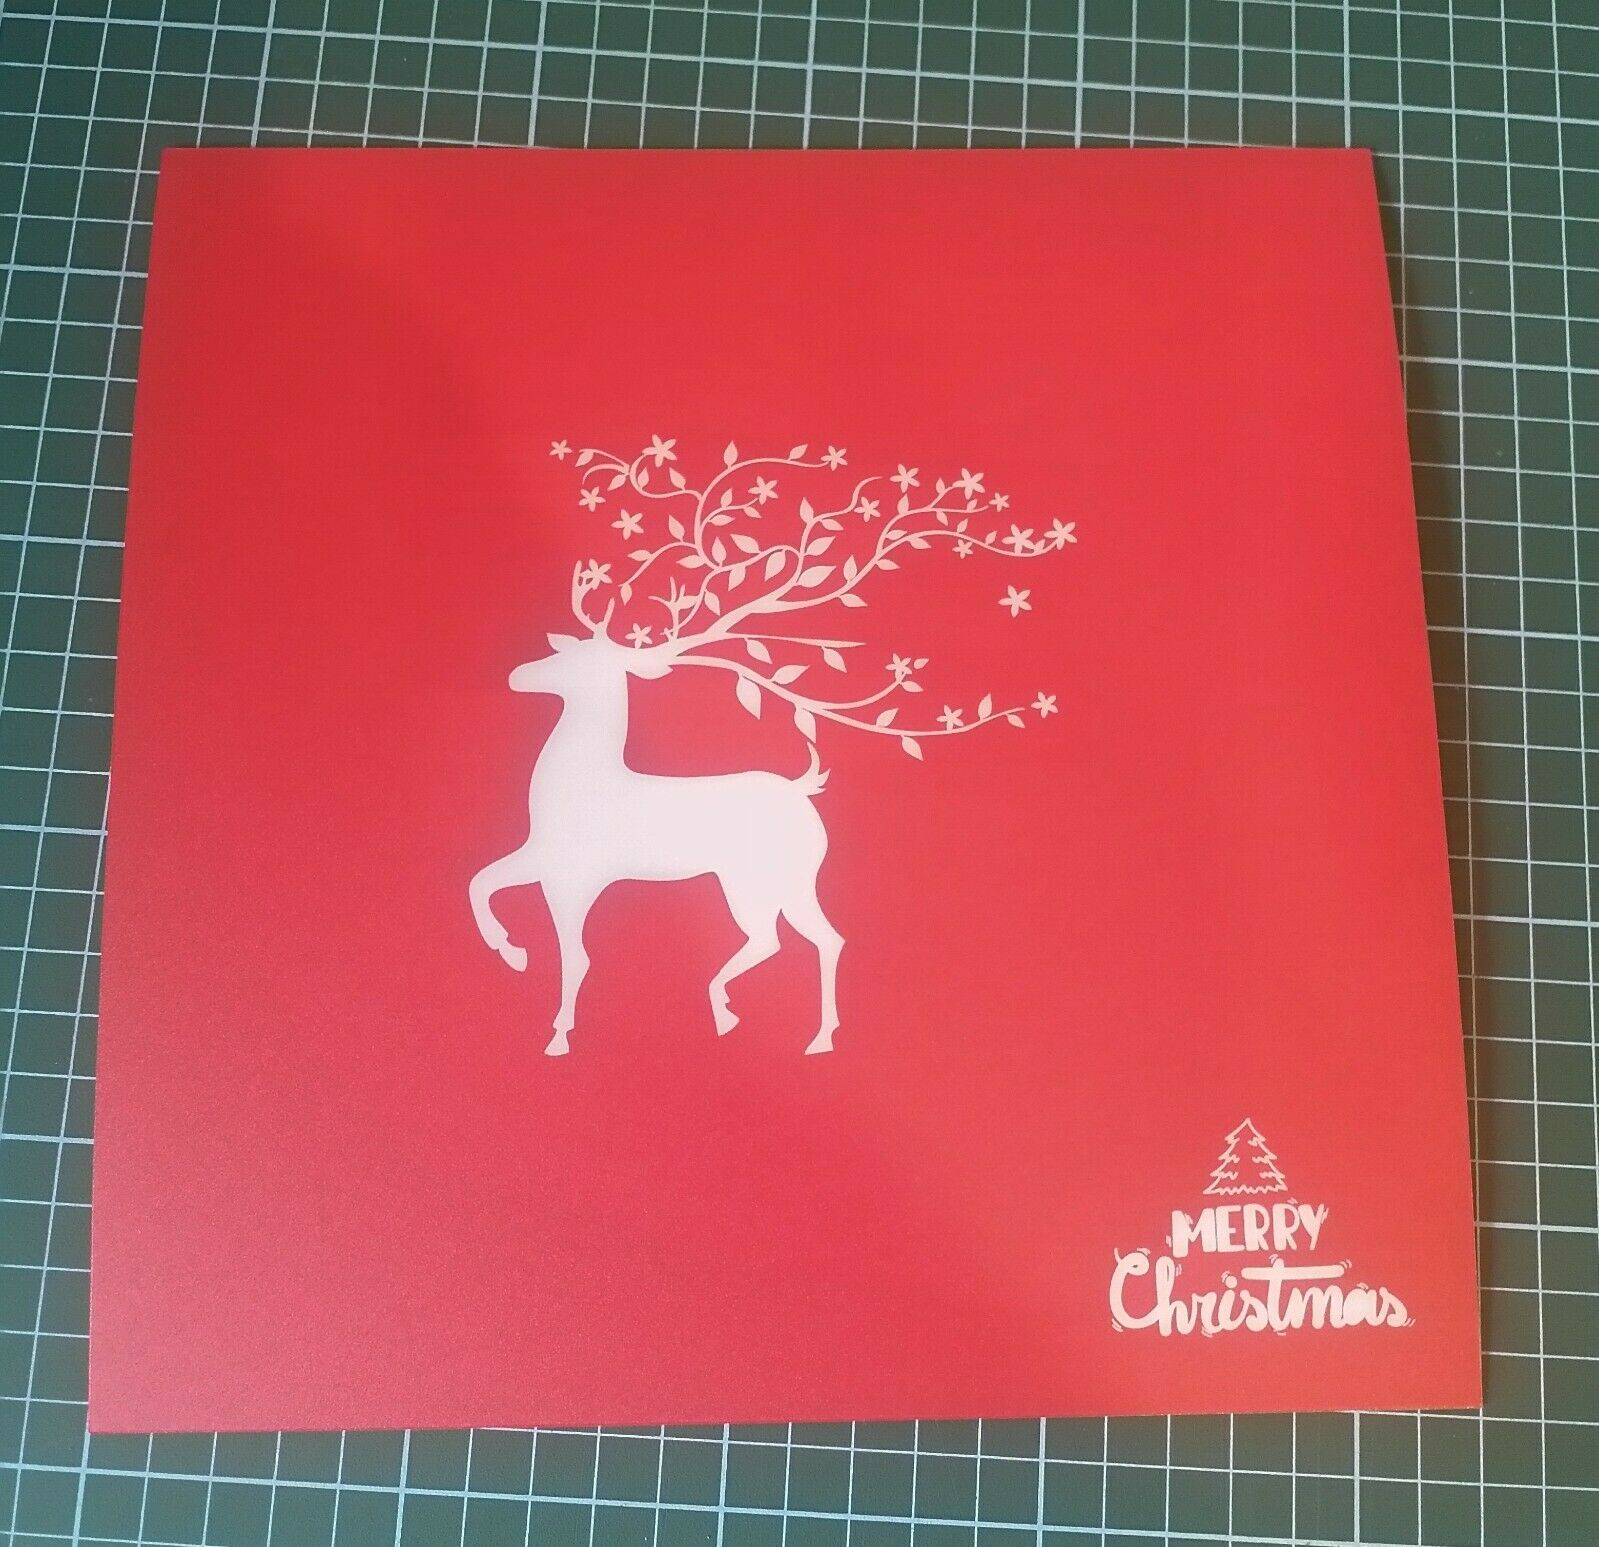 3D Printer Heat Hot Bed Sticker , Non-Magnetic,22*22cm, 8,6*8,6 inch